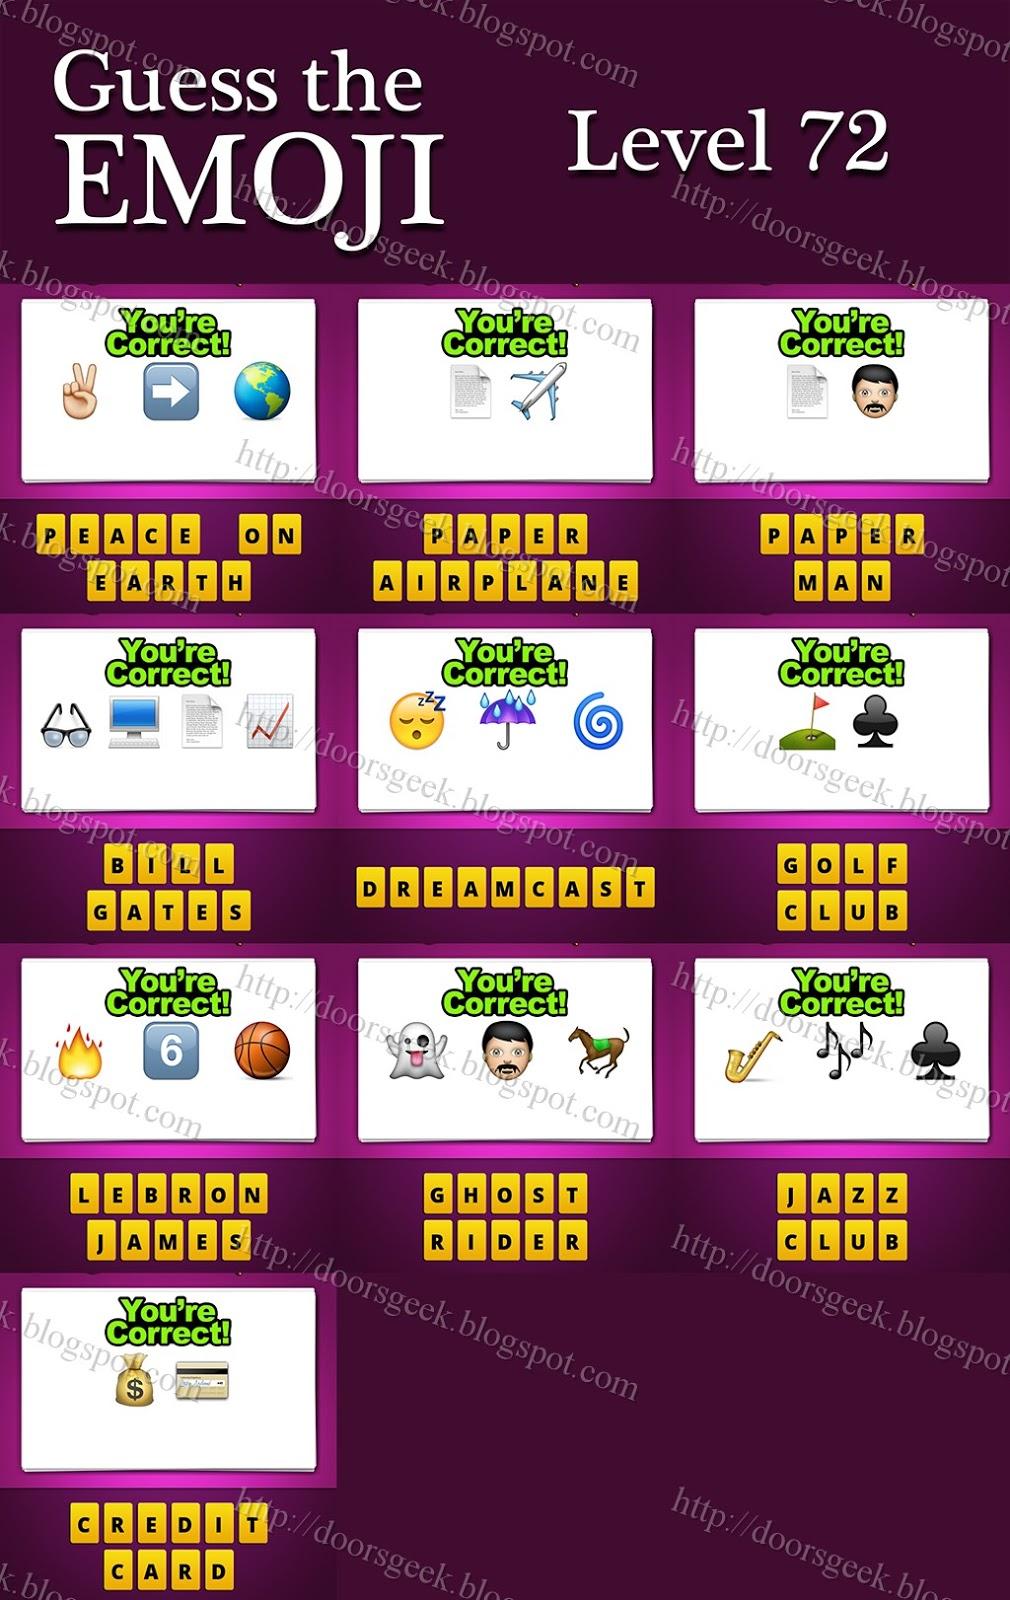 Guess The Emoji Level 72 Guess The Emoji  Level 72